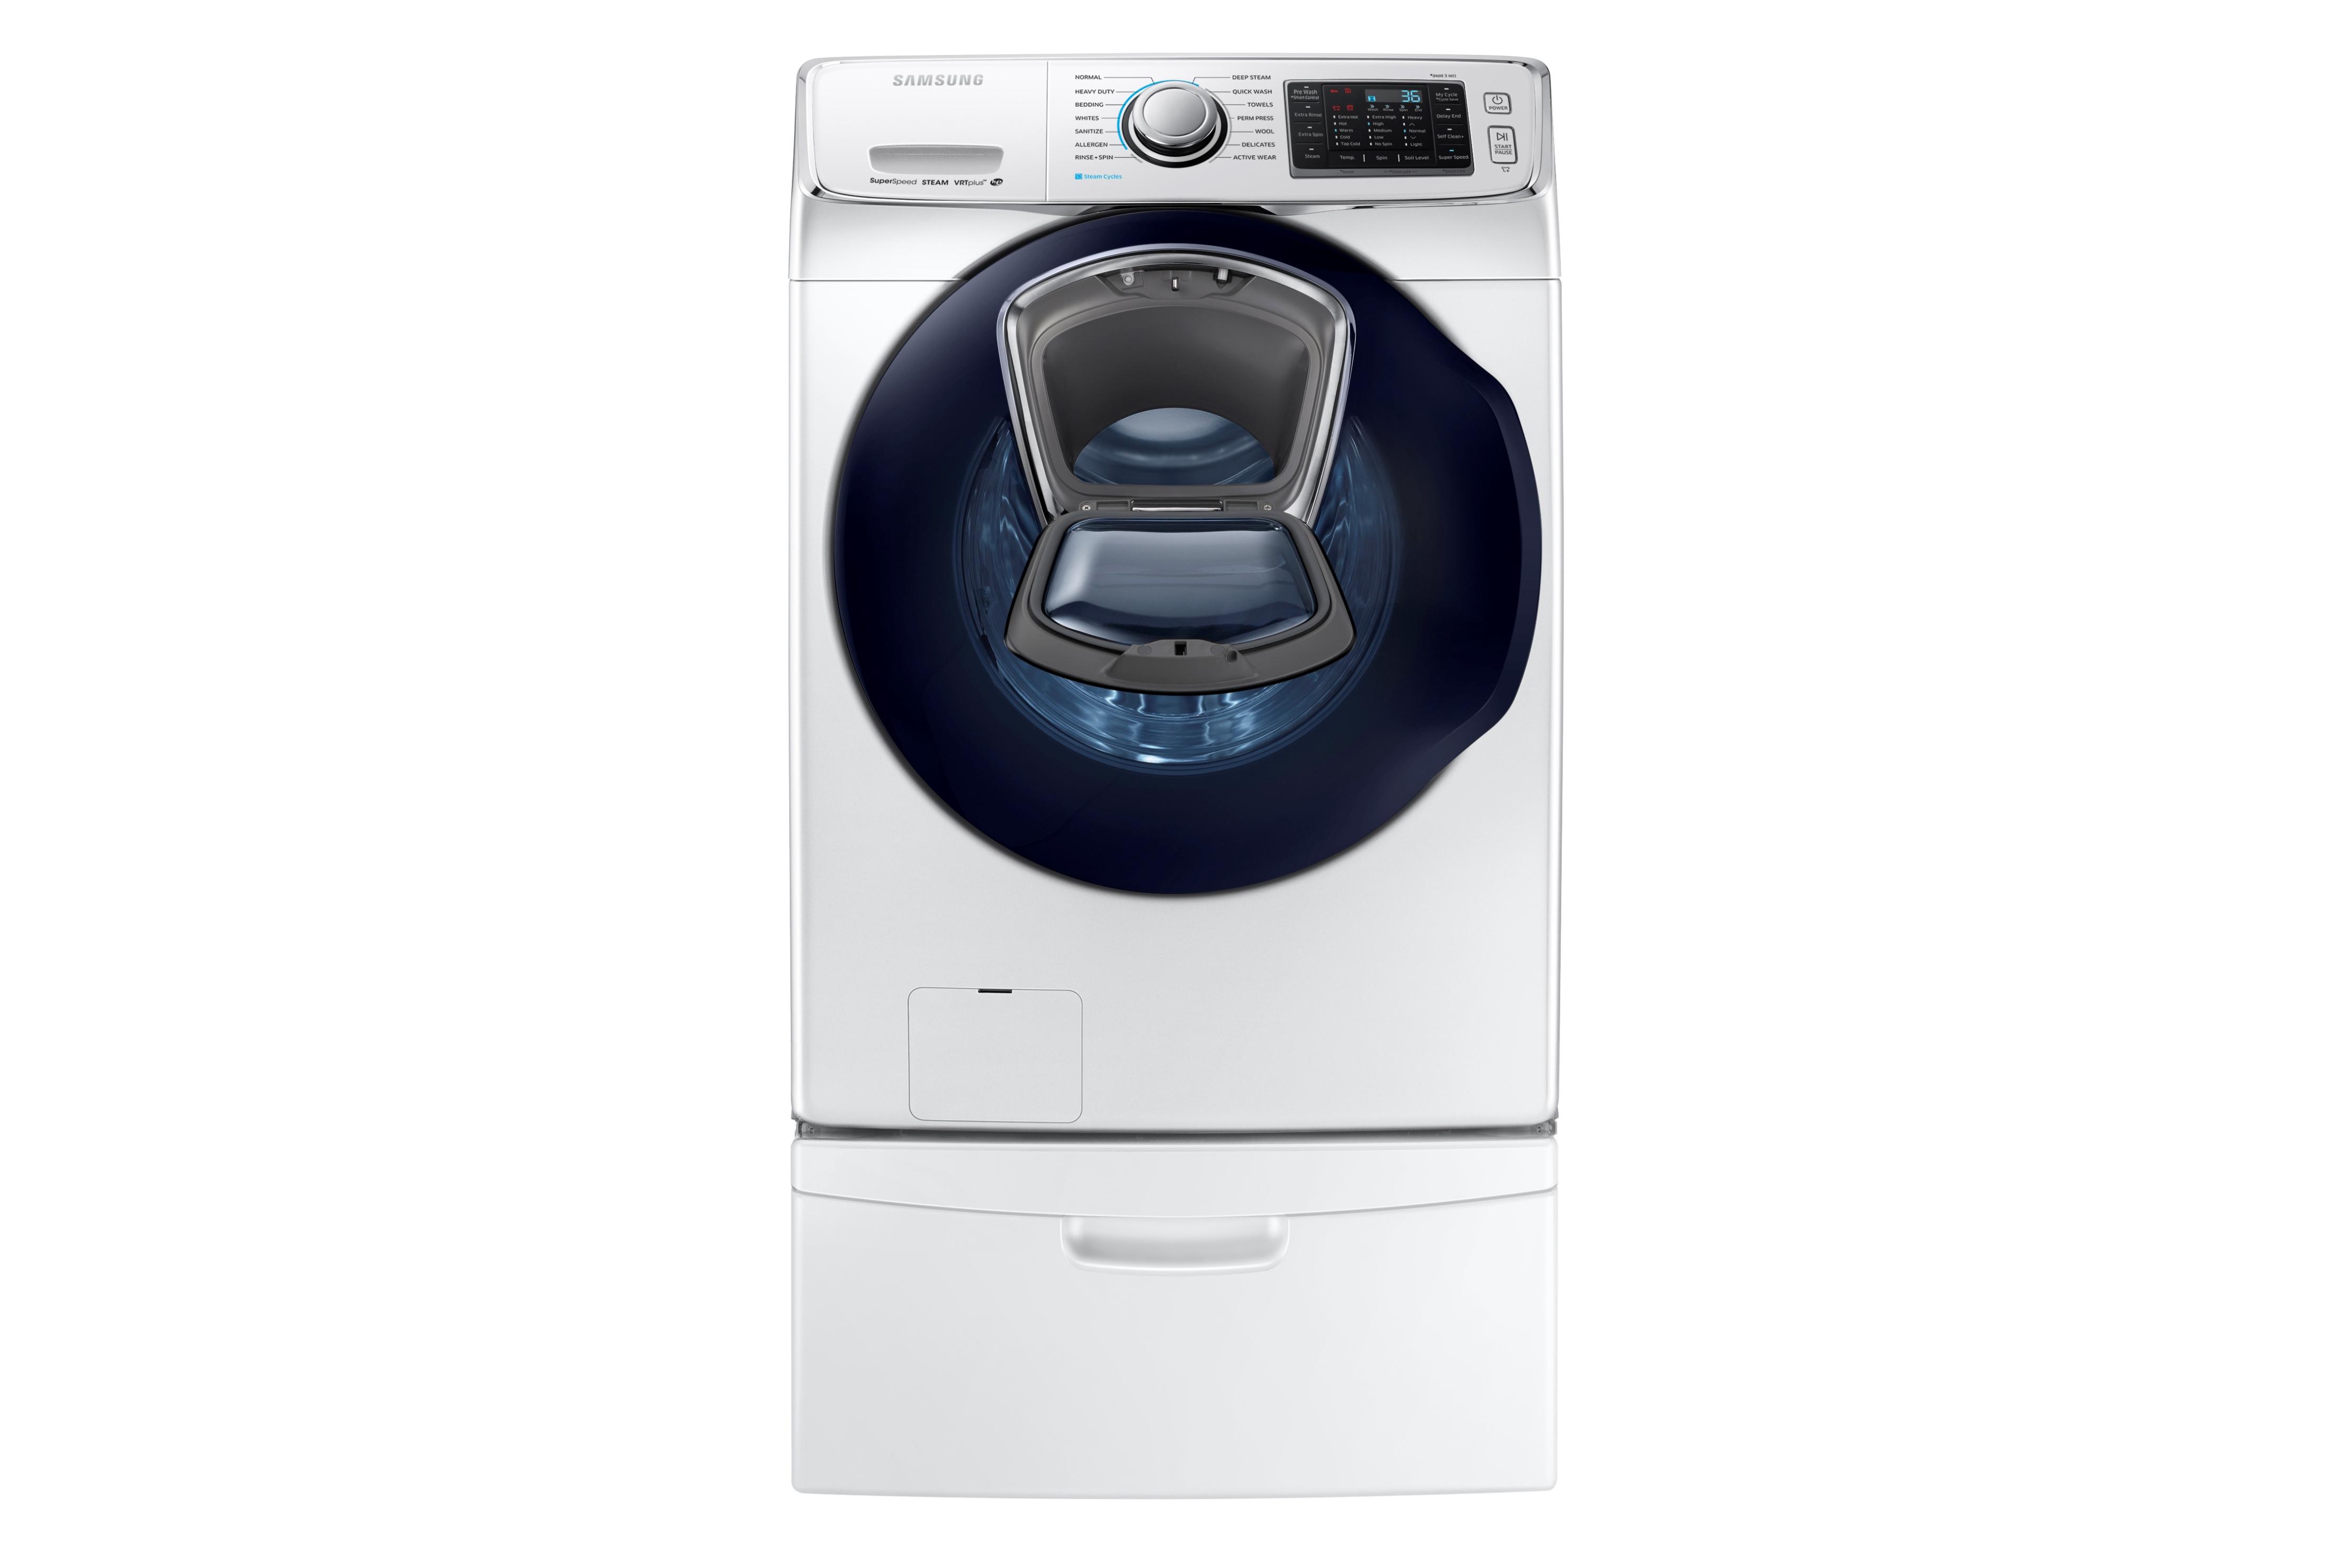 Samsung WF45K6200AW 4.5 cu. ft. AddWash™ Front Load Washer White